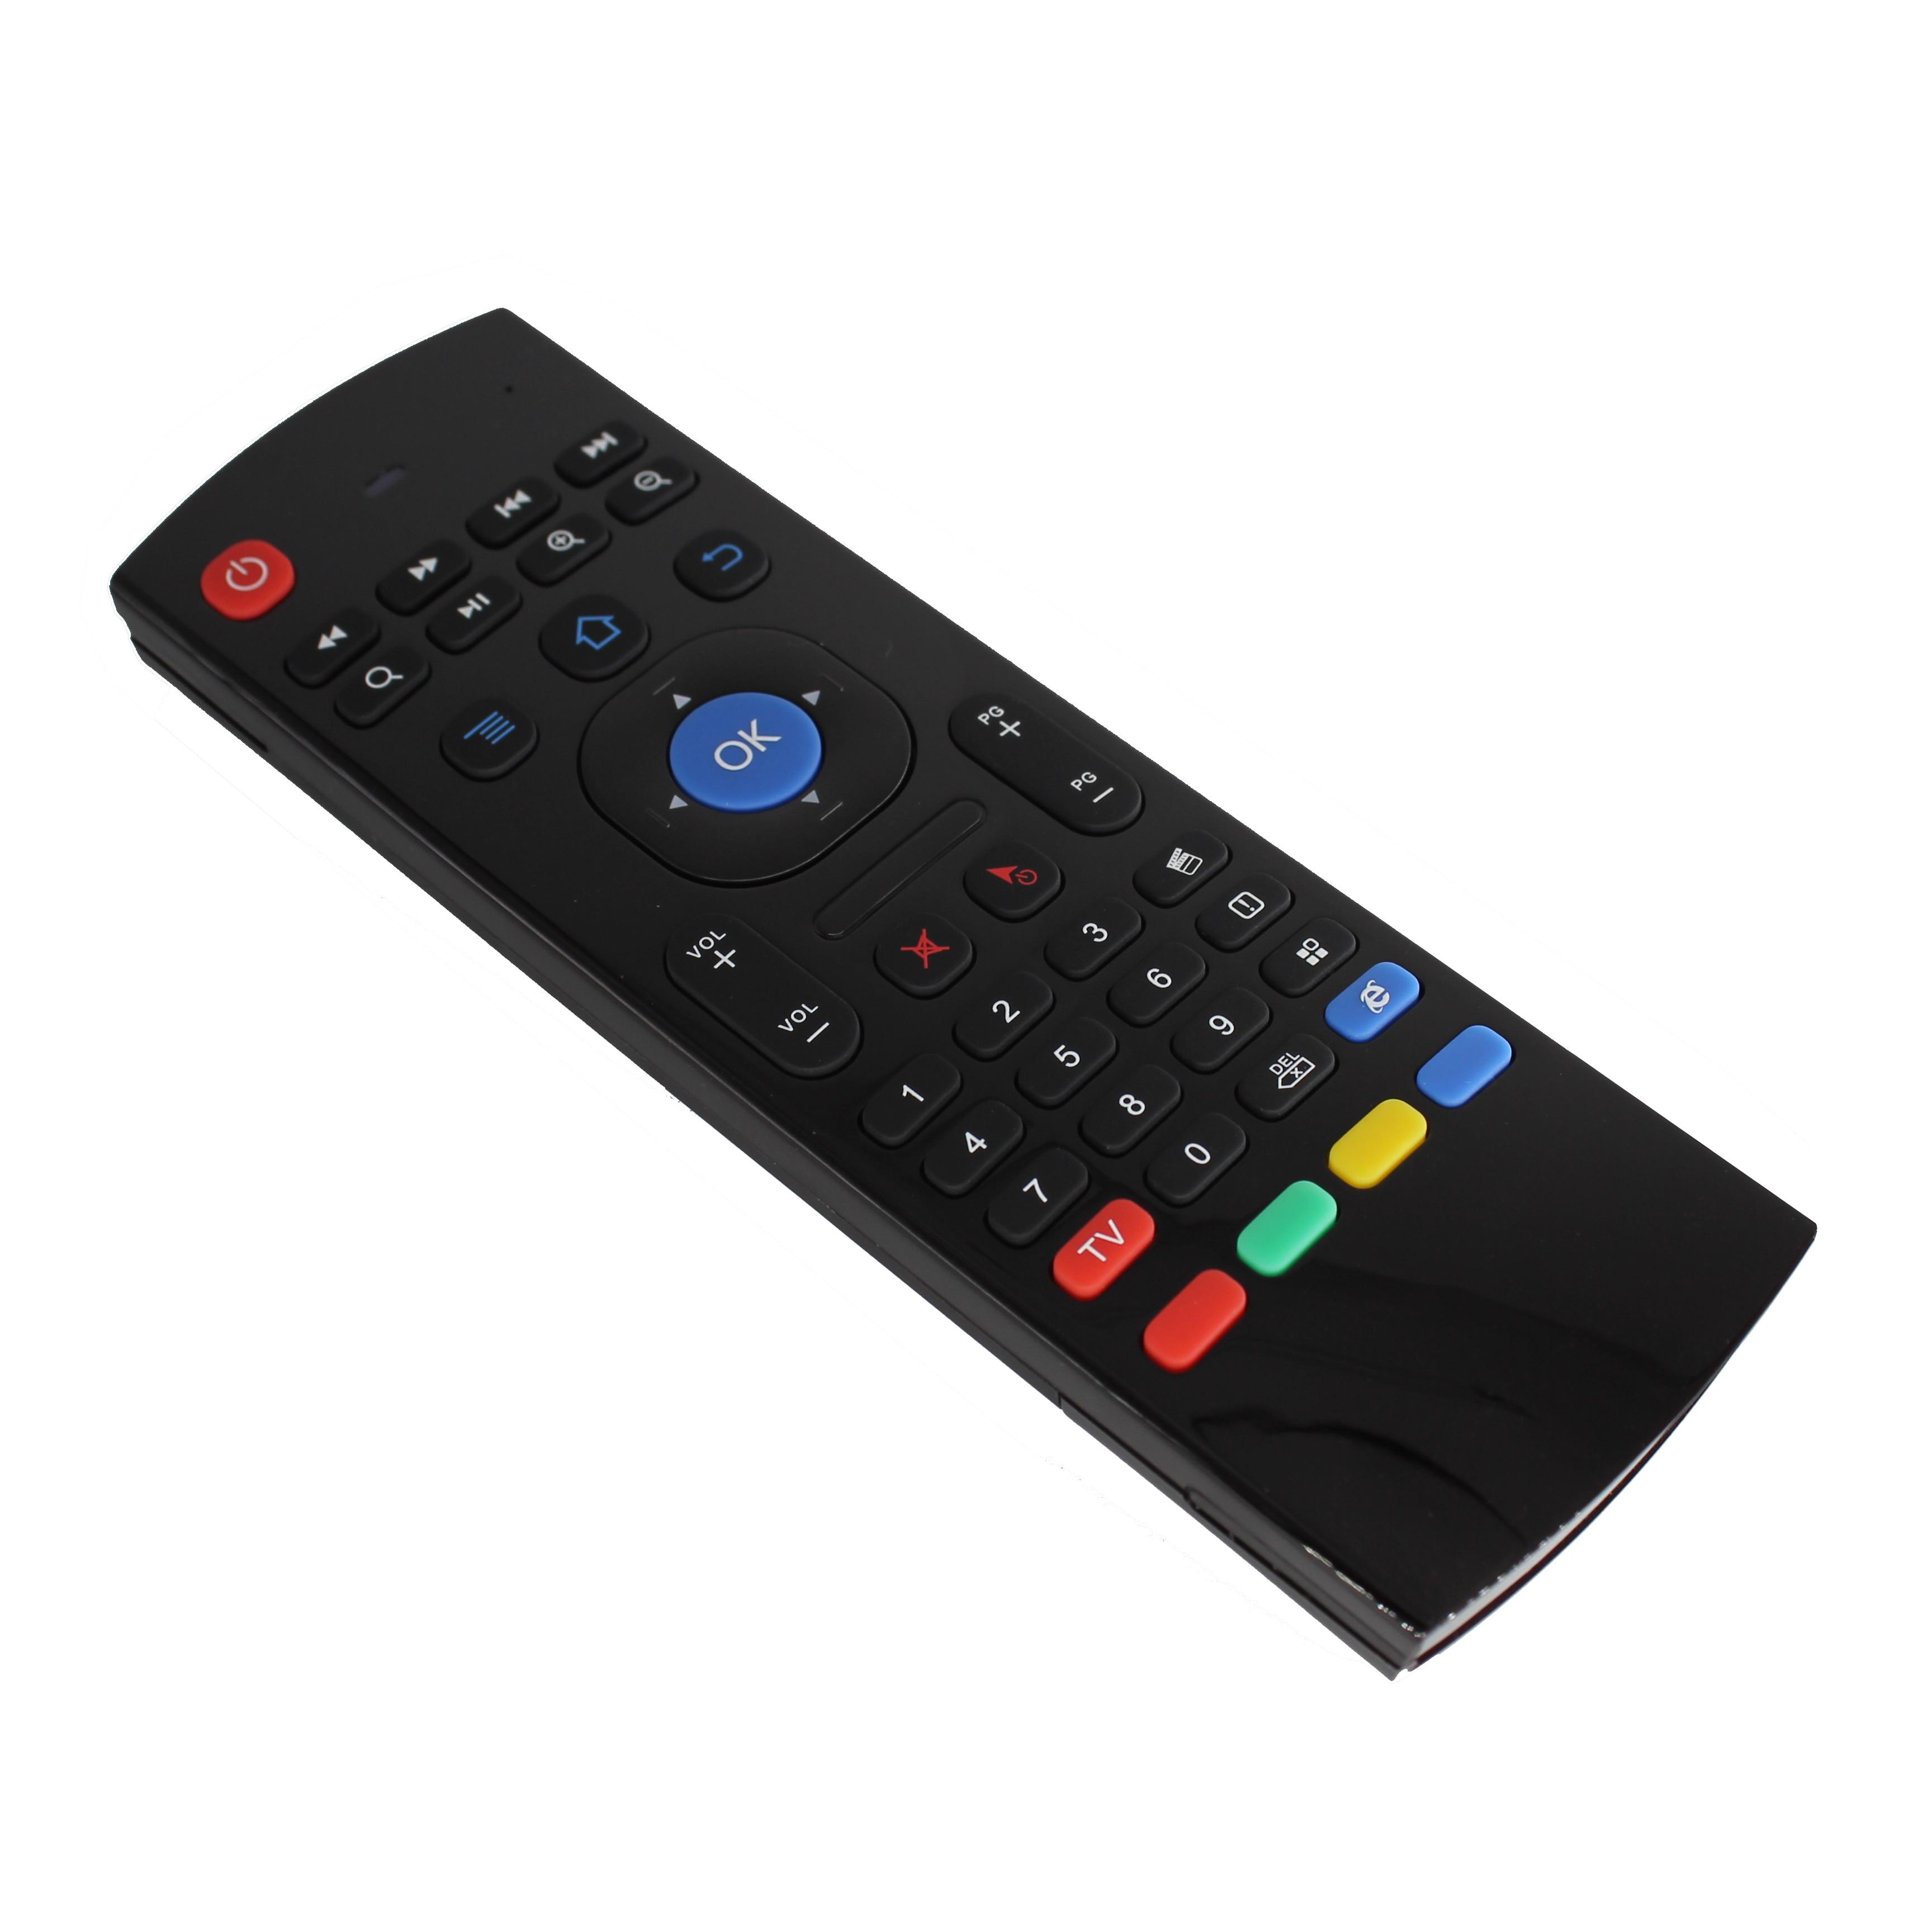 Quente mx3 voz backlit ar mouse google inteligente controle remoto 2.4g rf teclado sem fio para h96 max 3318 caixa de tv android teclado